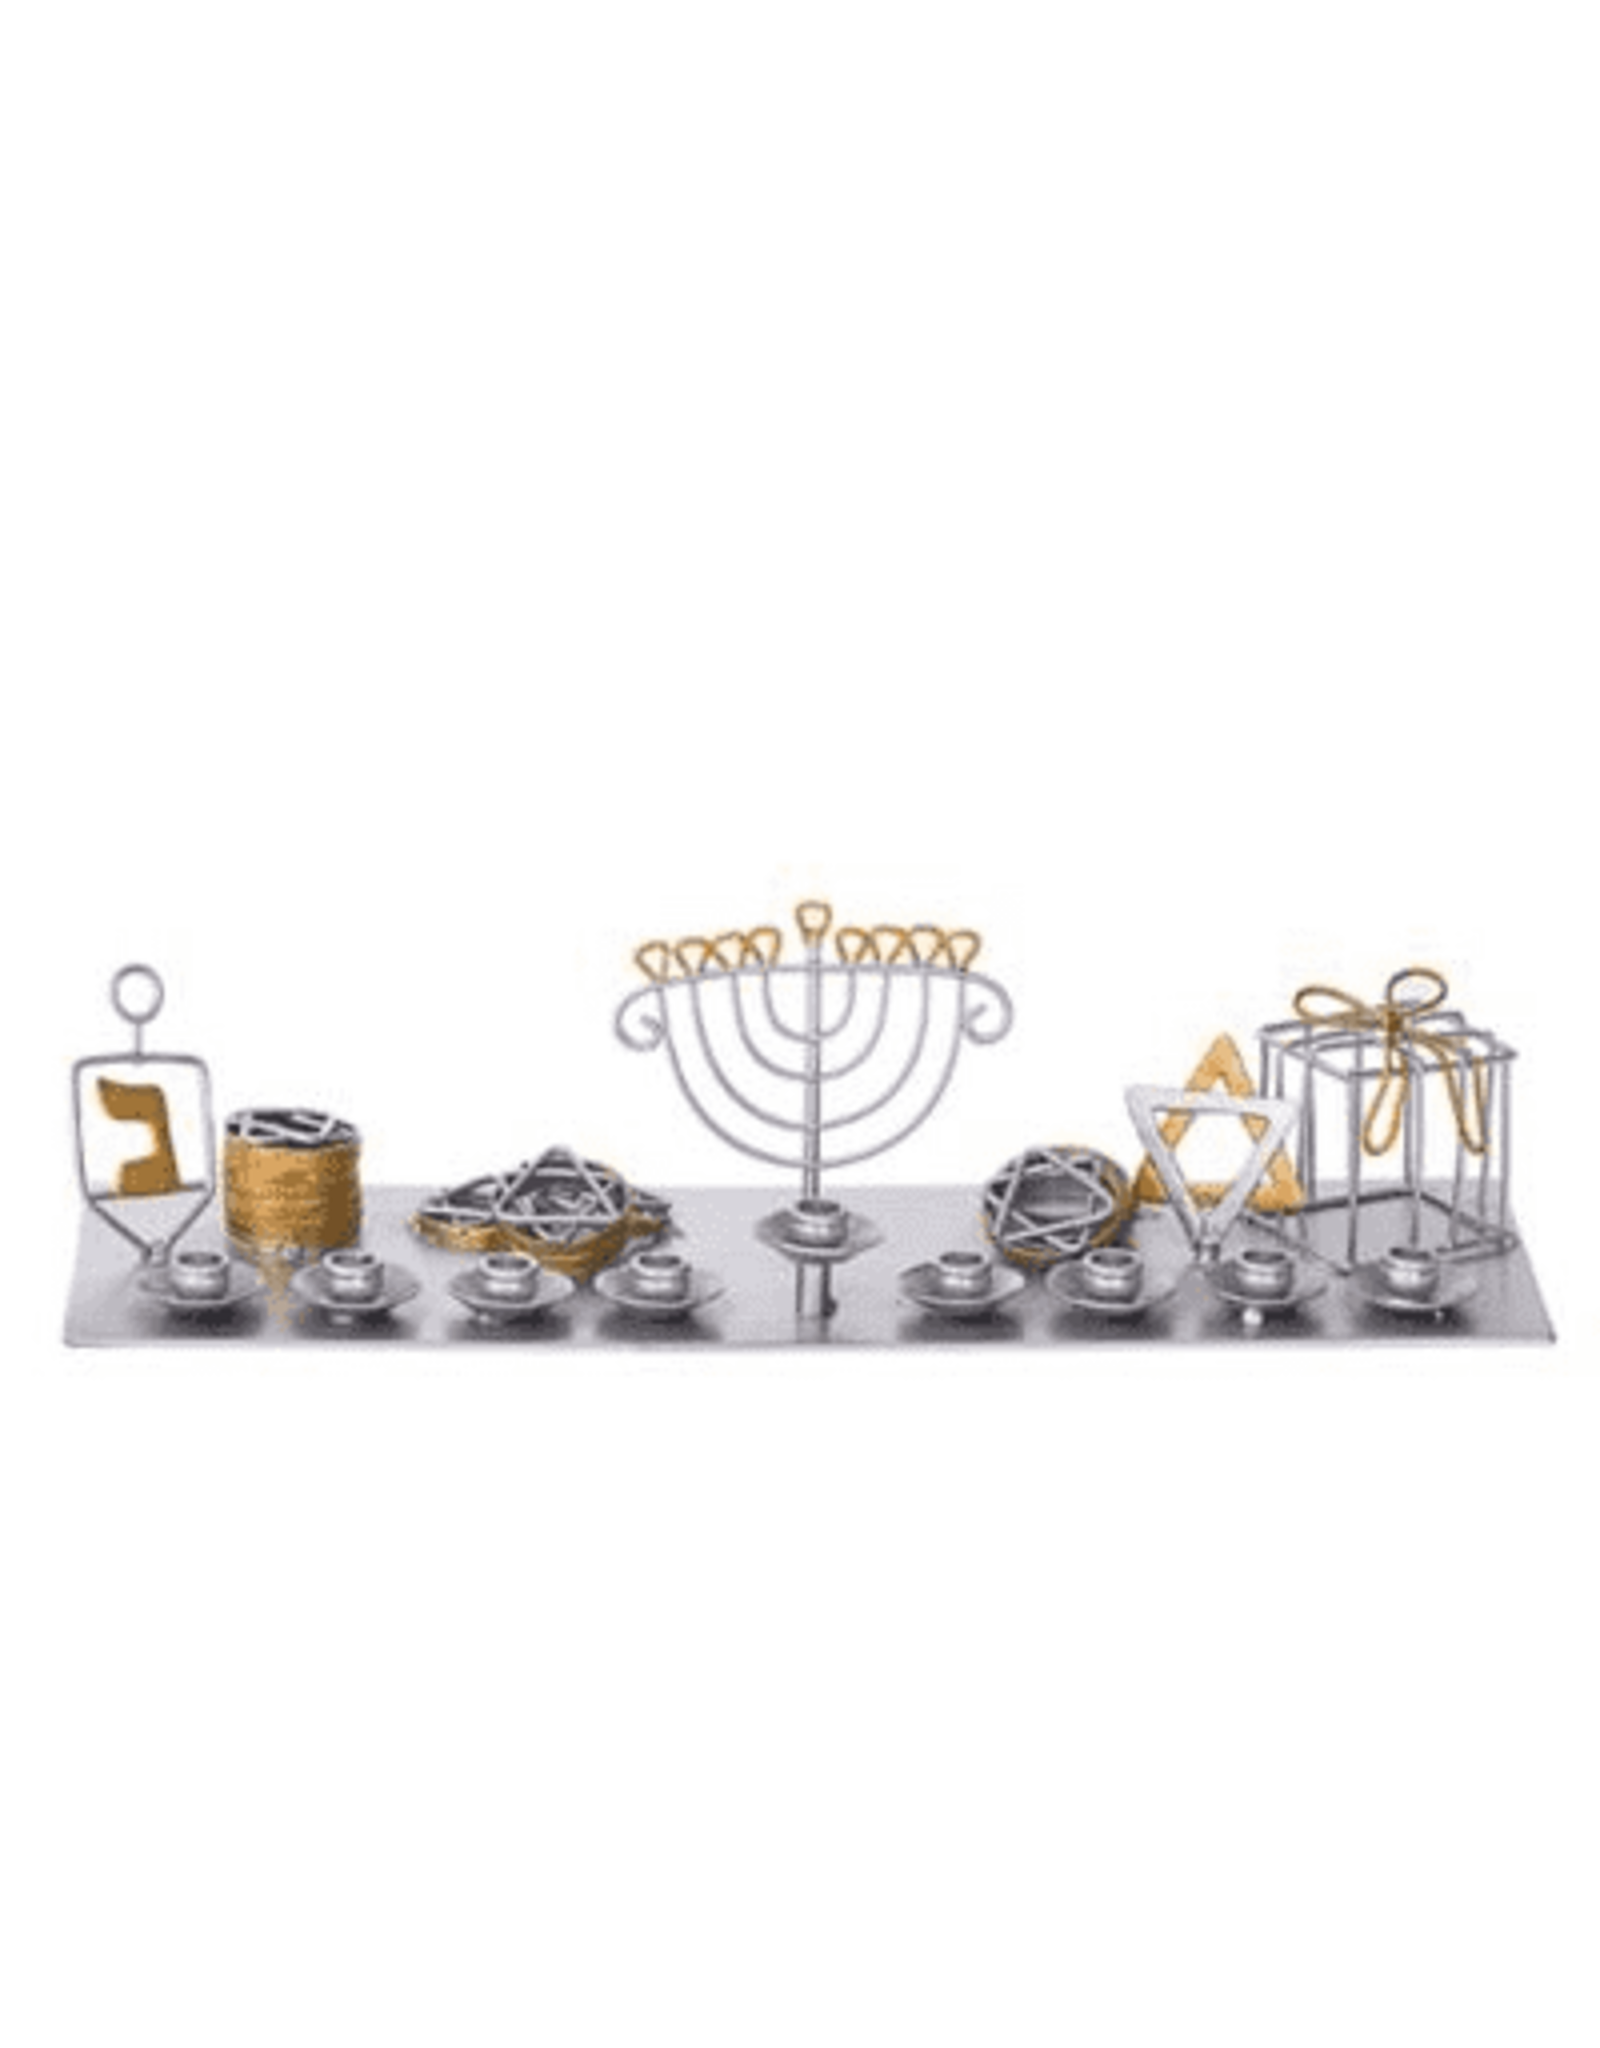 Legacy Menorah with Dreidel, Gelt and Gift Box